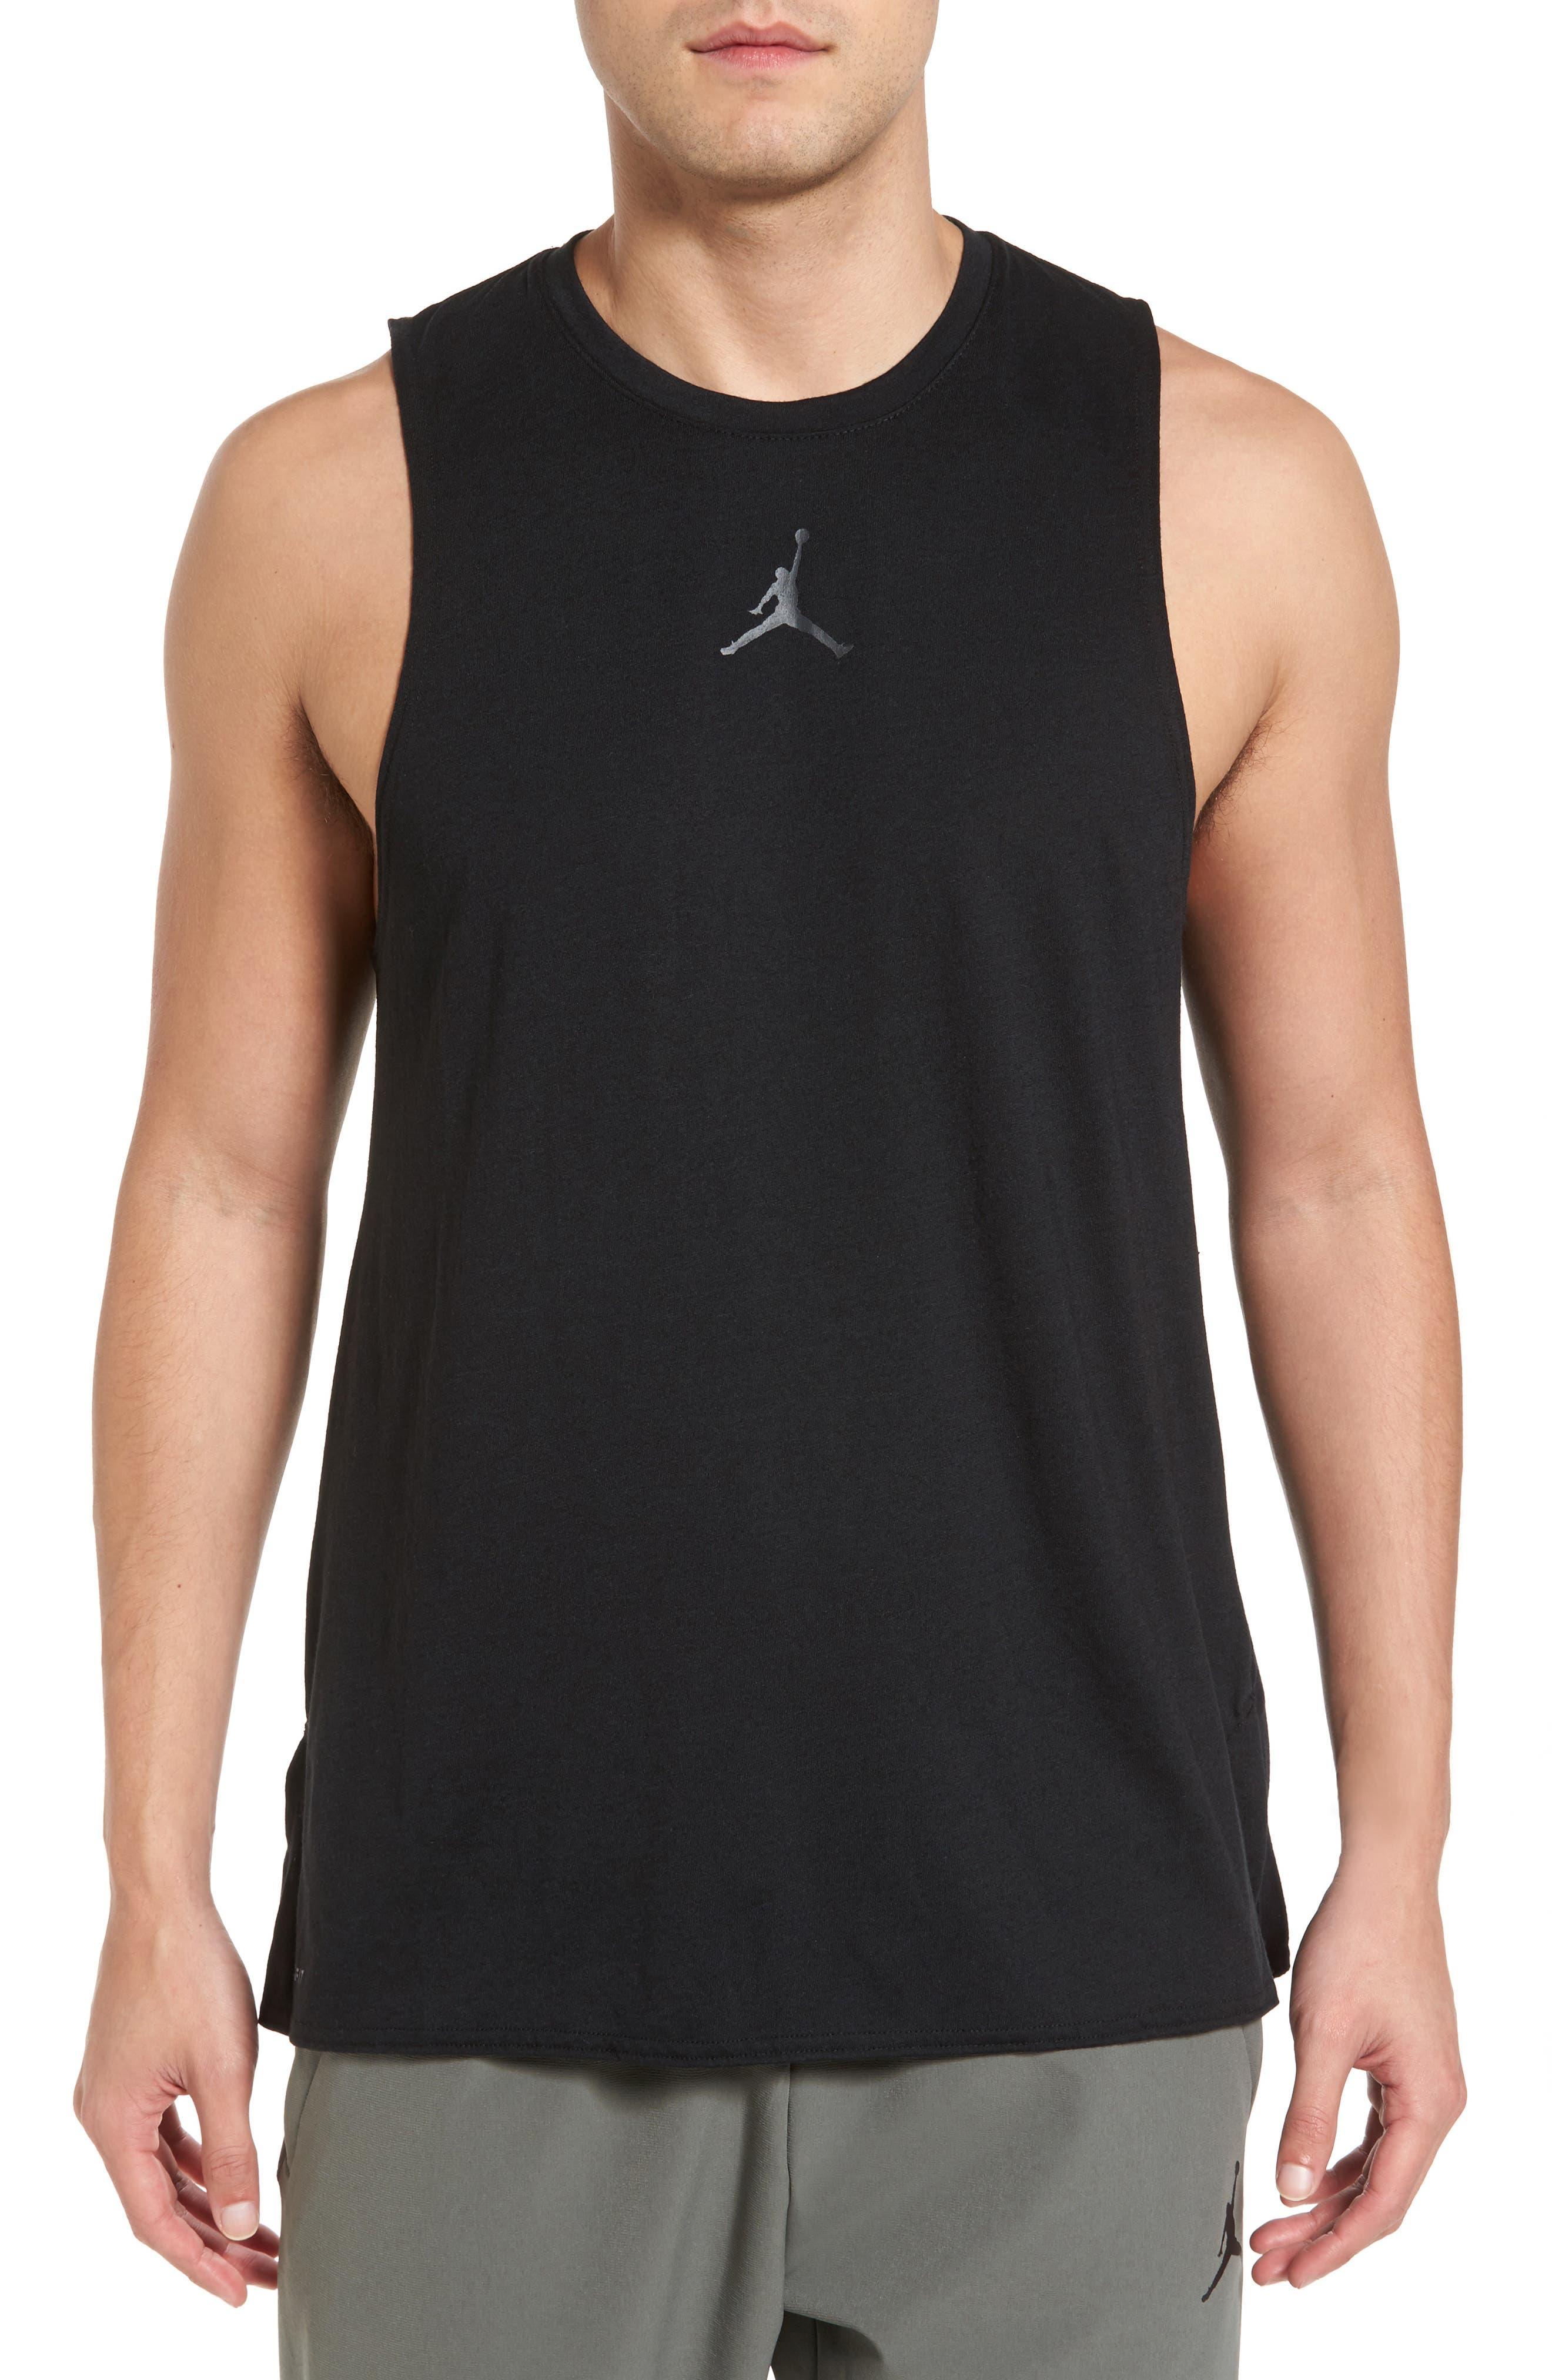 Nike Jordan 23 Tech Tank